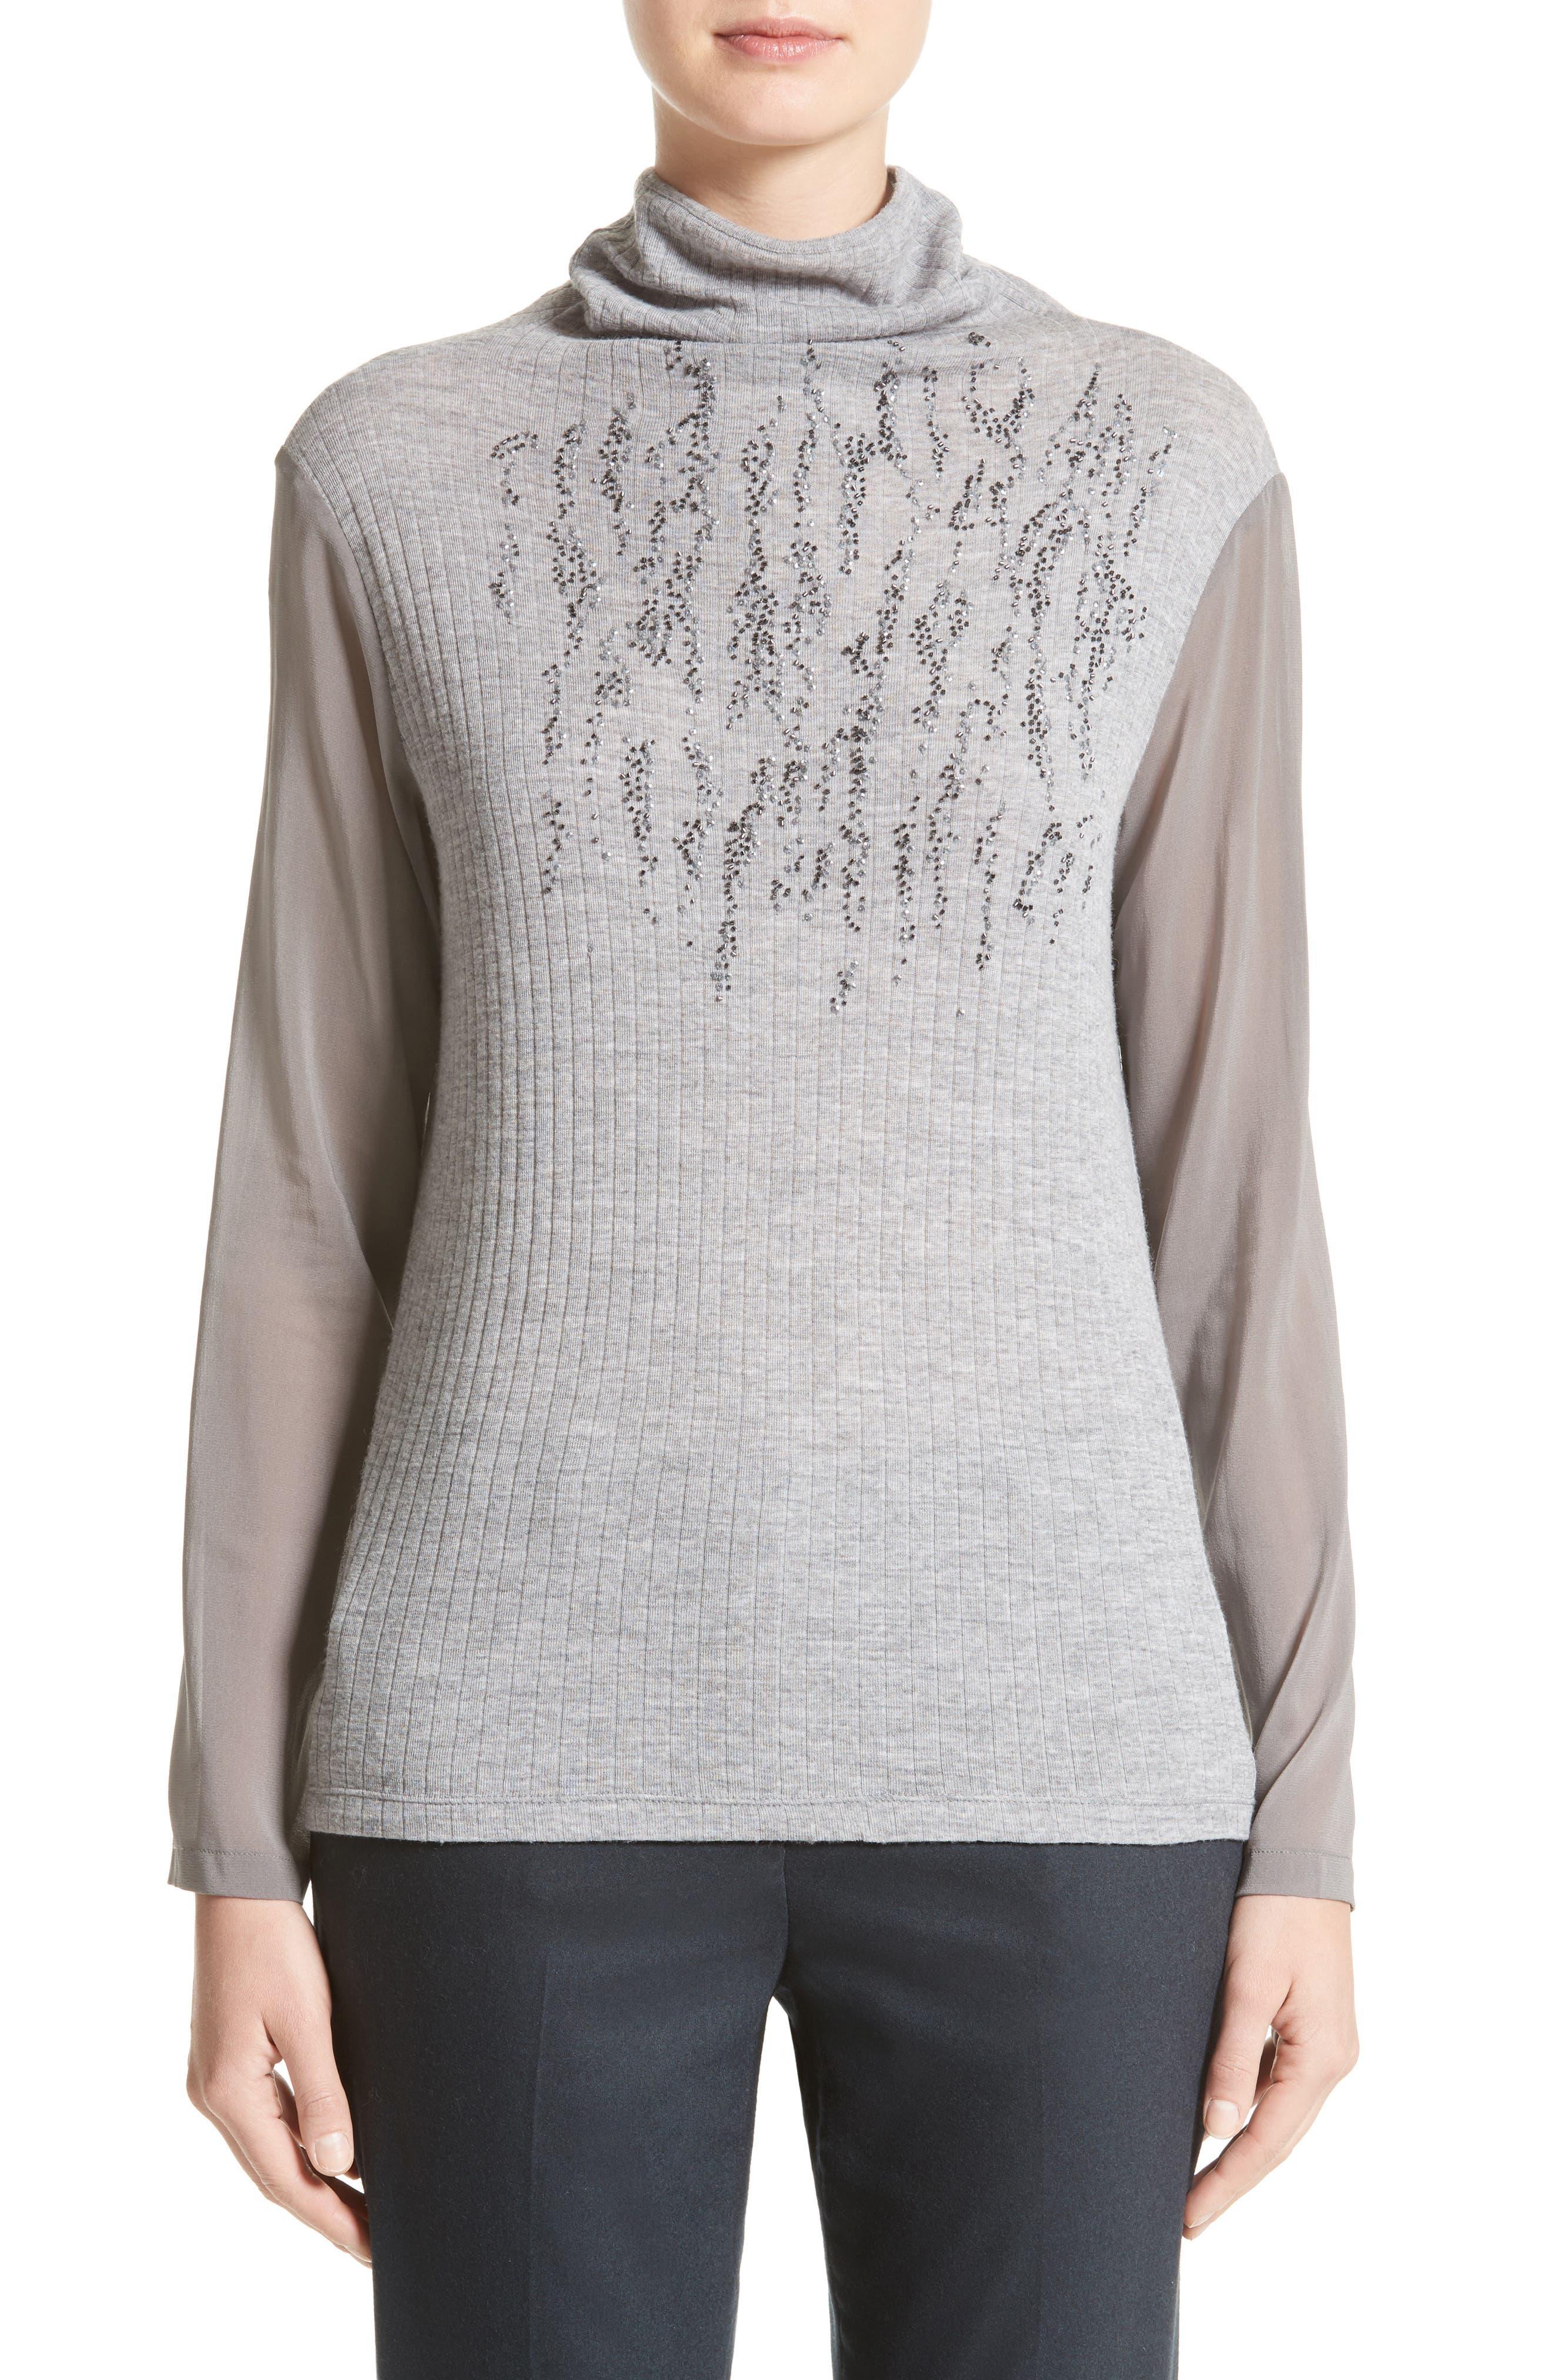 Fabiana Filippi Sequin Wool Turtleneck